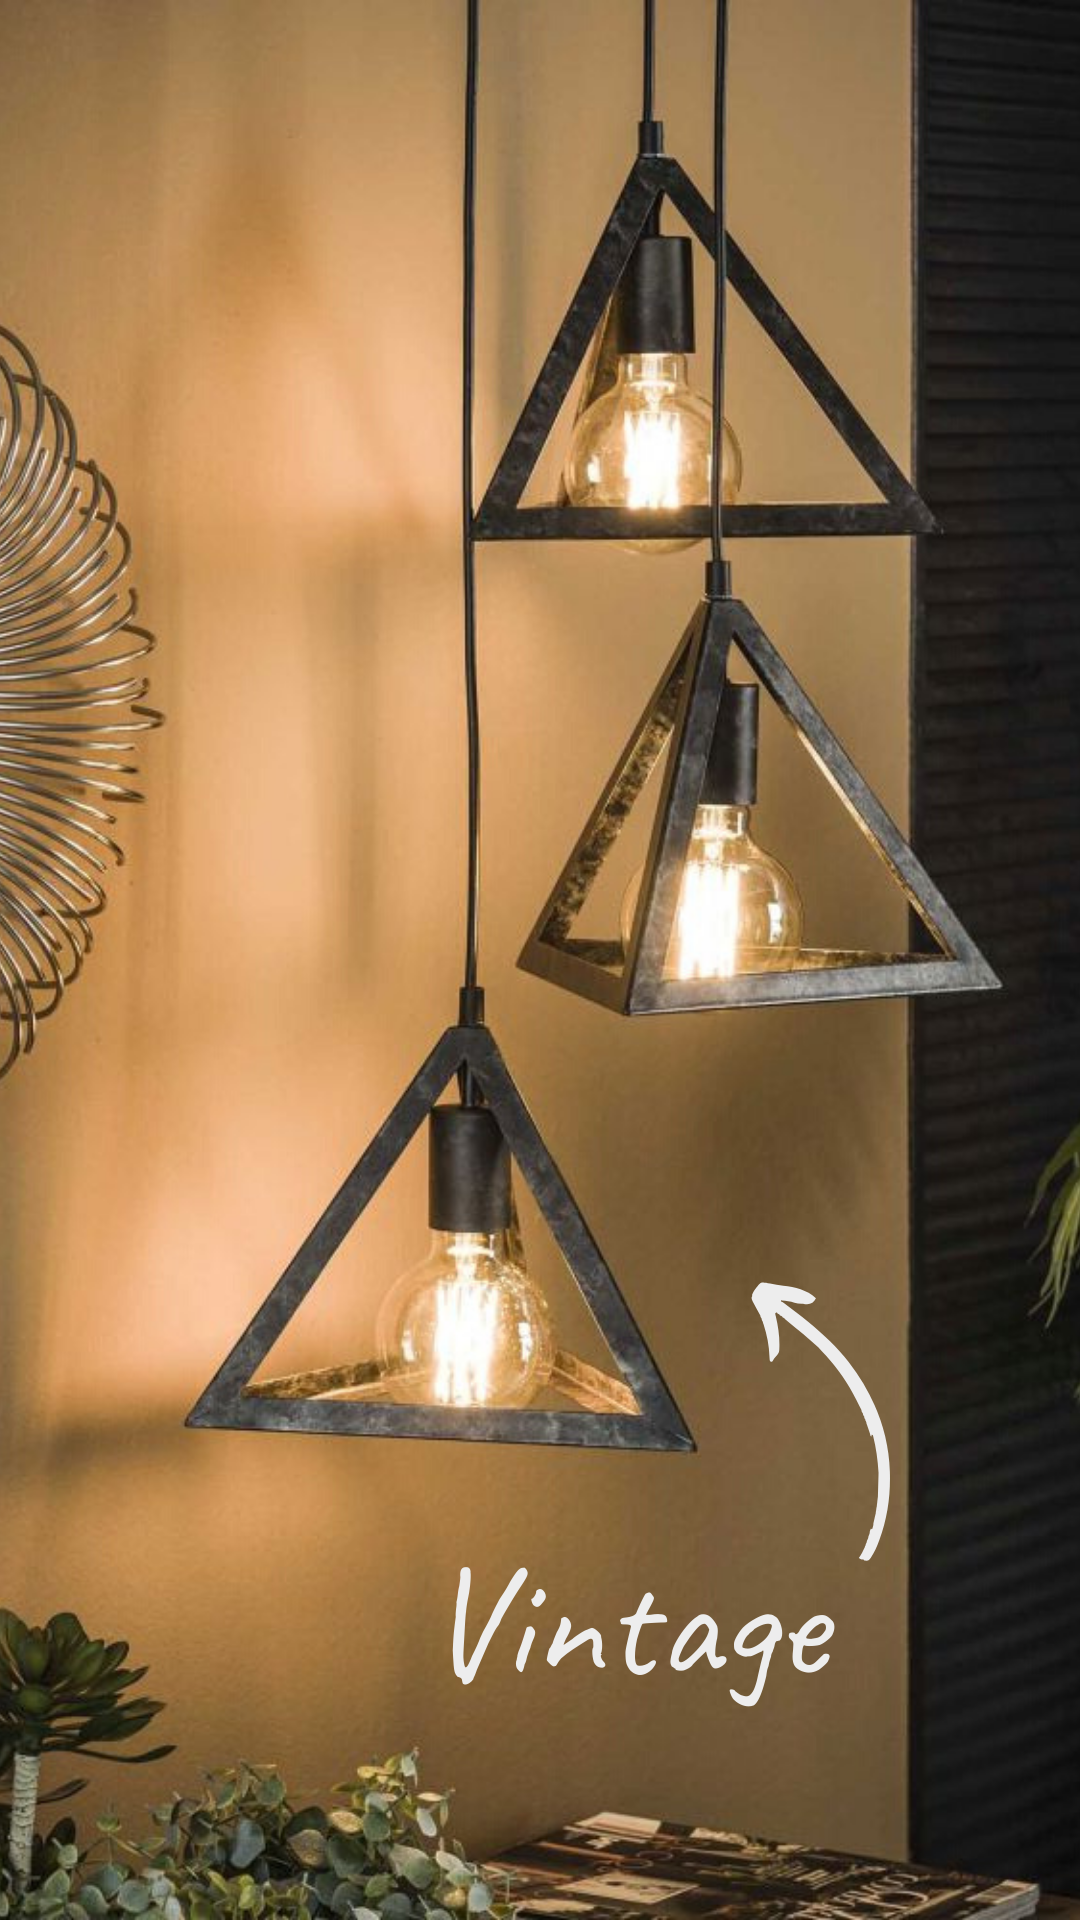 Vintage Lampen Und Retro Lampen Hauptbeleuchtung Hauptbeleuchtung Retrolampen Und Vinta In 2020 Vintage Lamps Retro Lamp Home Lighting